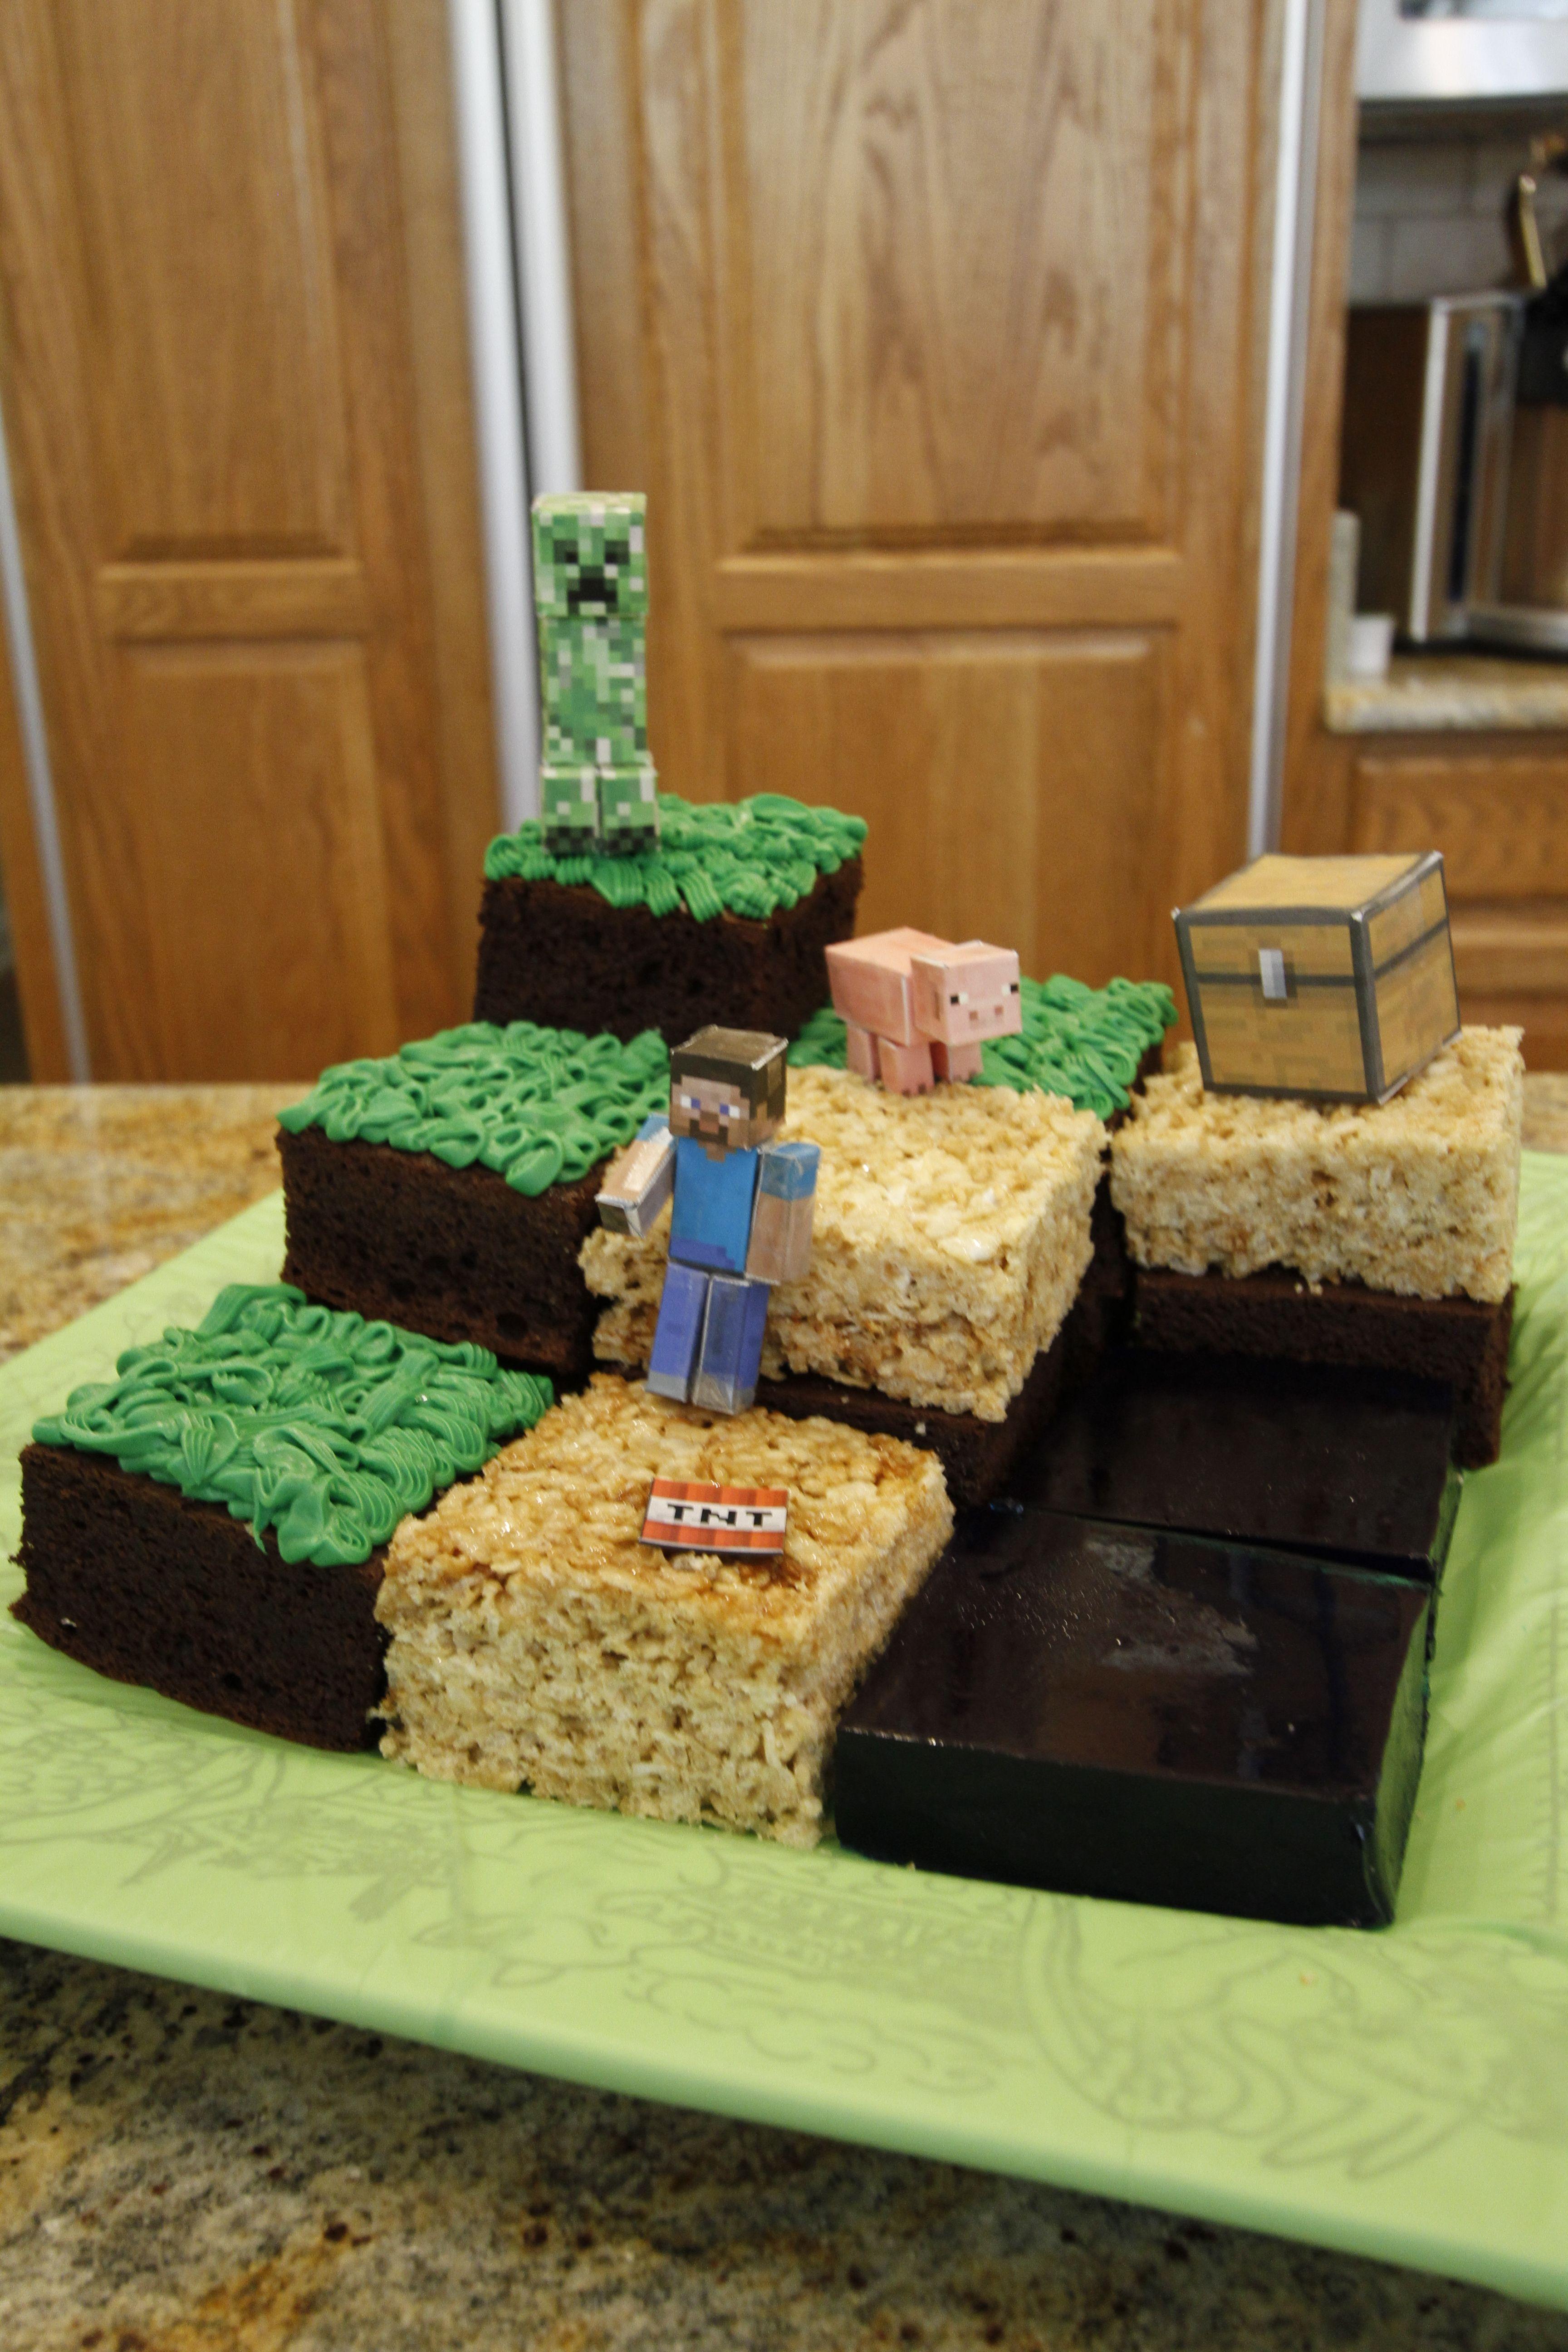 Jello jiggler cake recipe